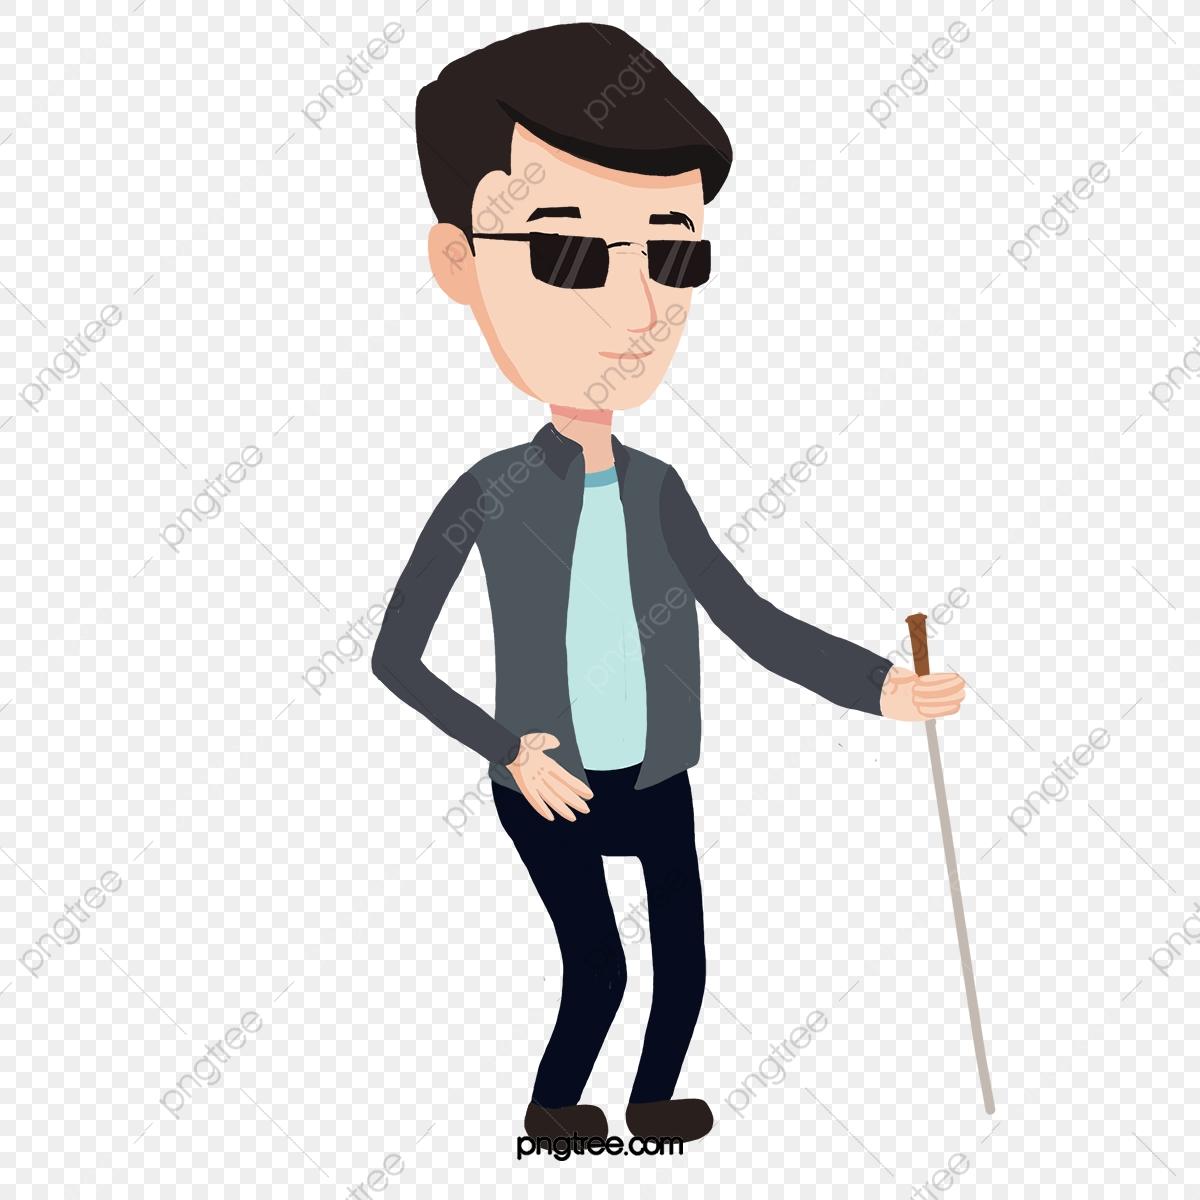 A Blind Man Walking, Man Clipart, Walking Clipart, Cartoon PNG.